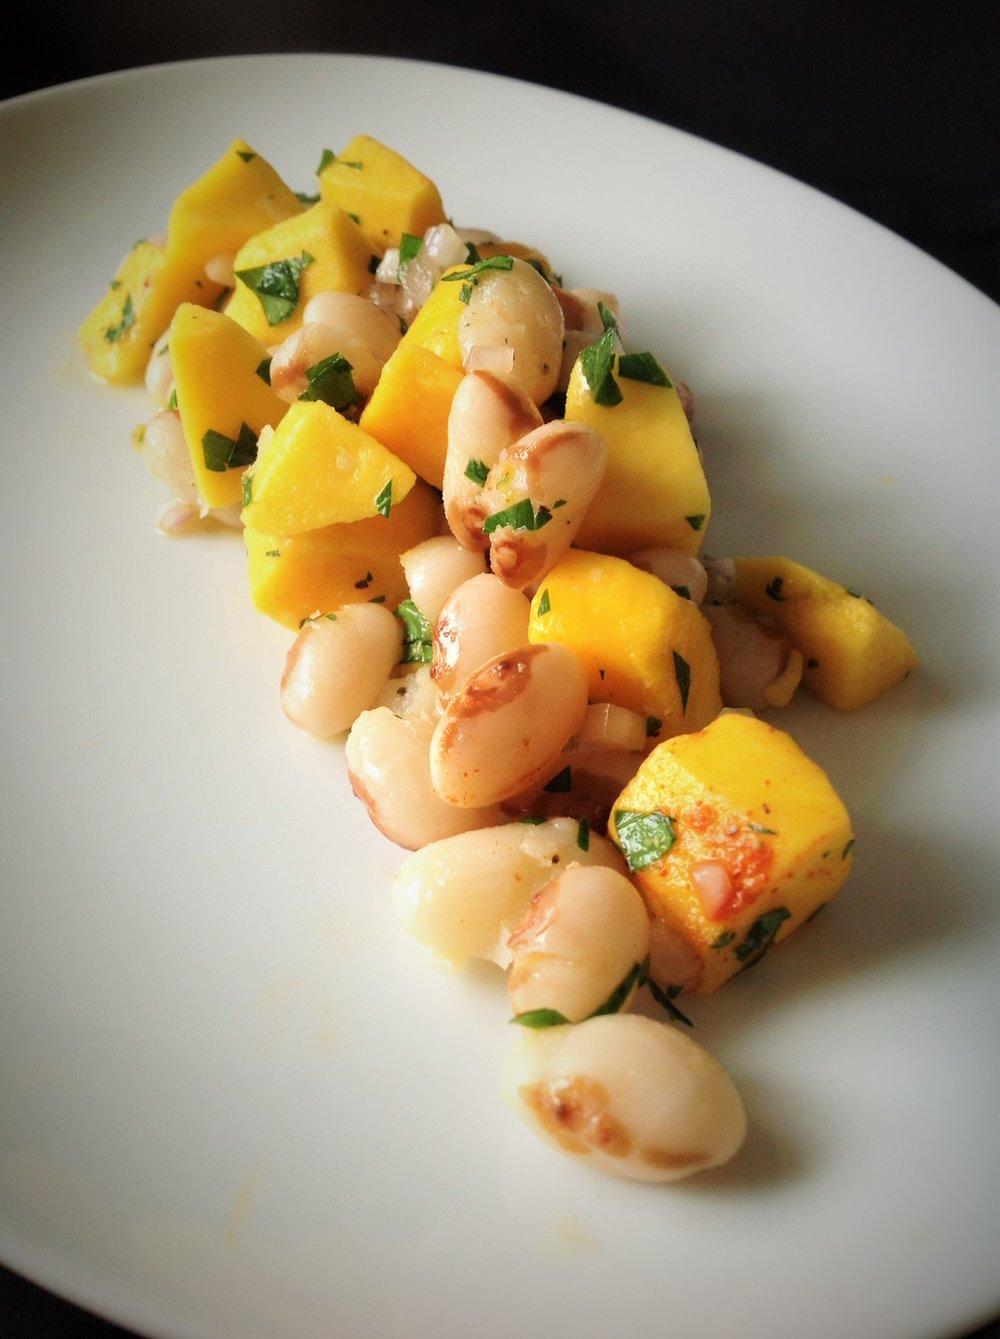 Yellow Eye Steuben Bean Mango Salad - Healthy, Oil-Free, Gluten-Free, Plant-Based, Vegan